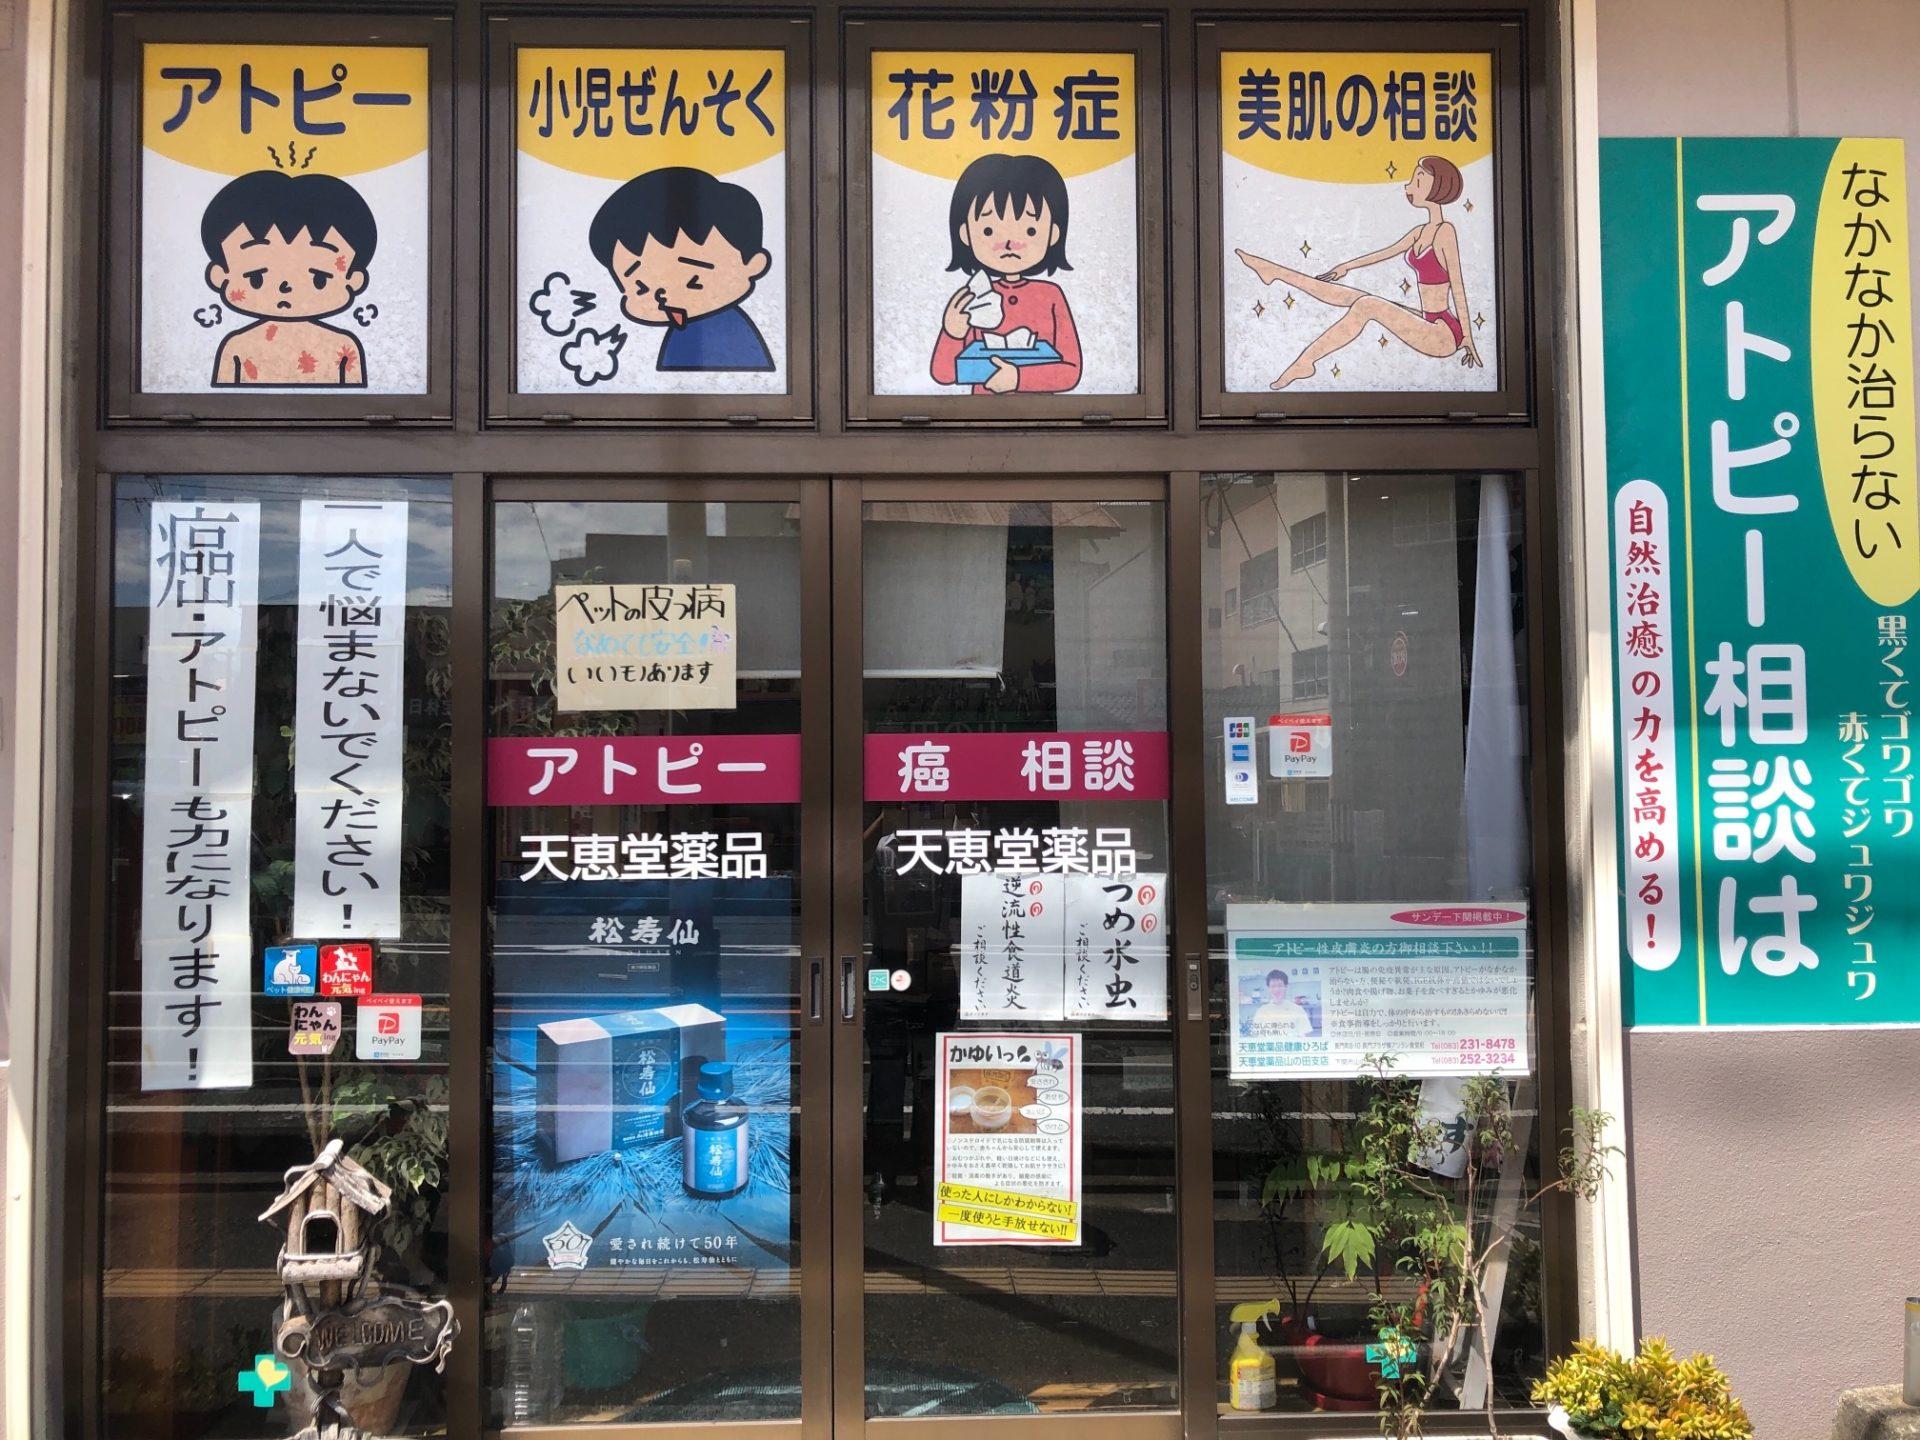 天恵堂薬品 山の田支店